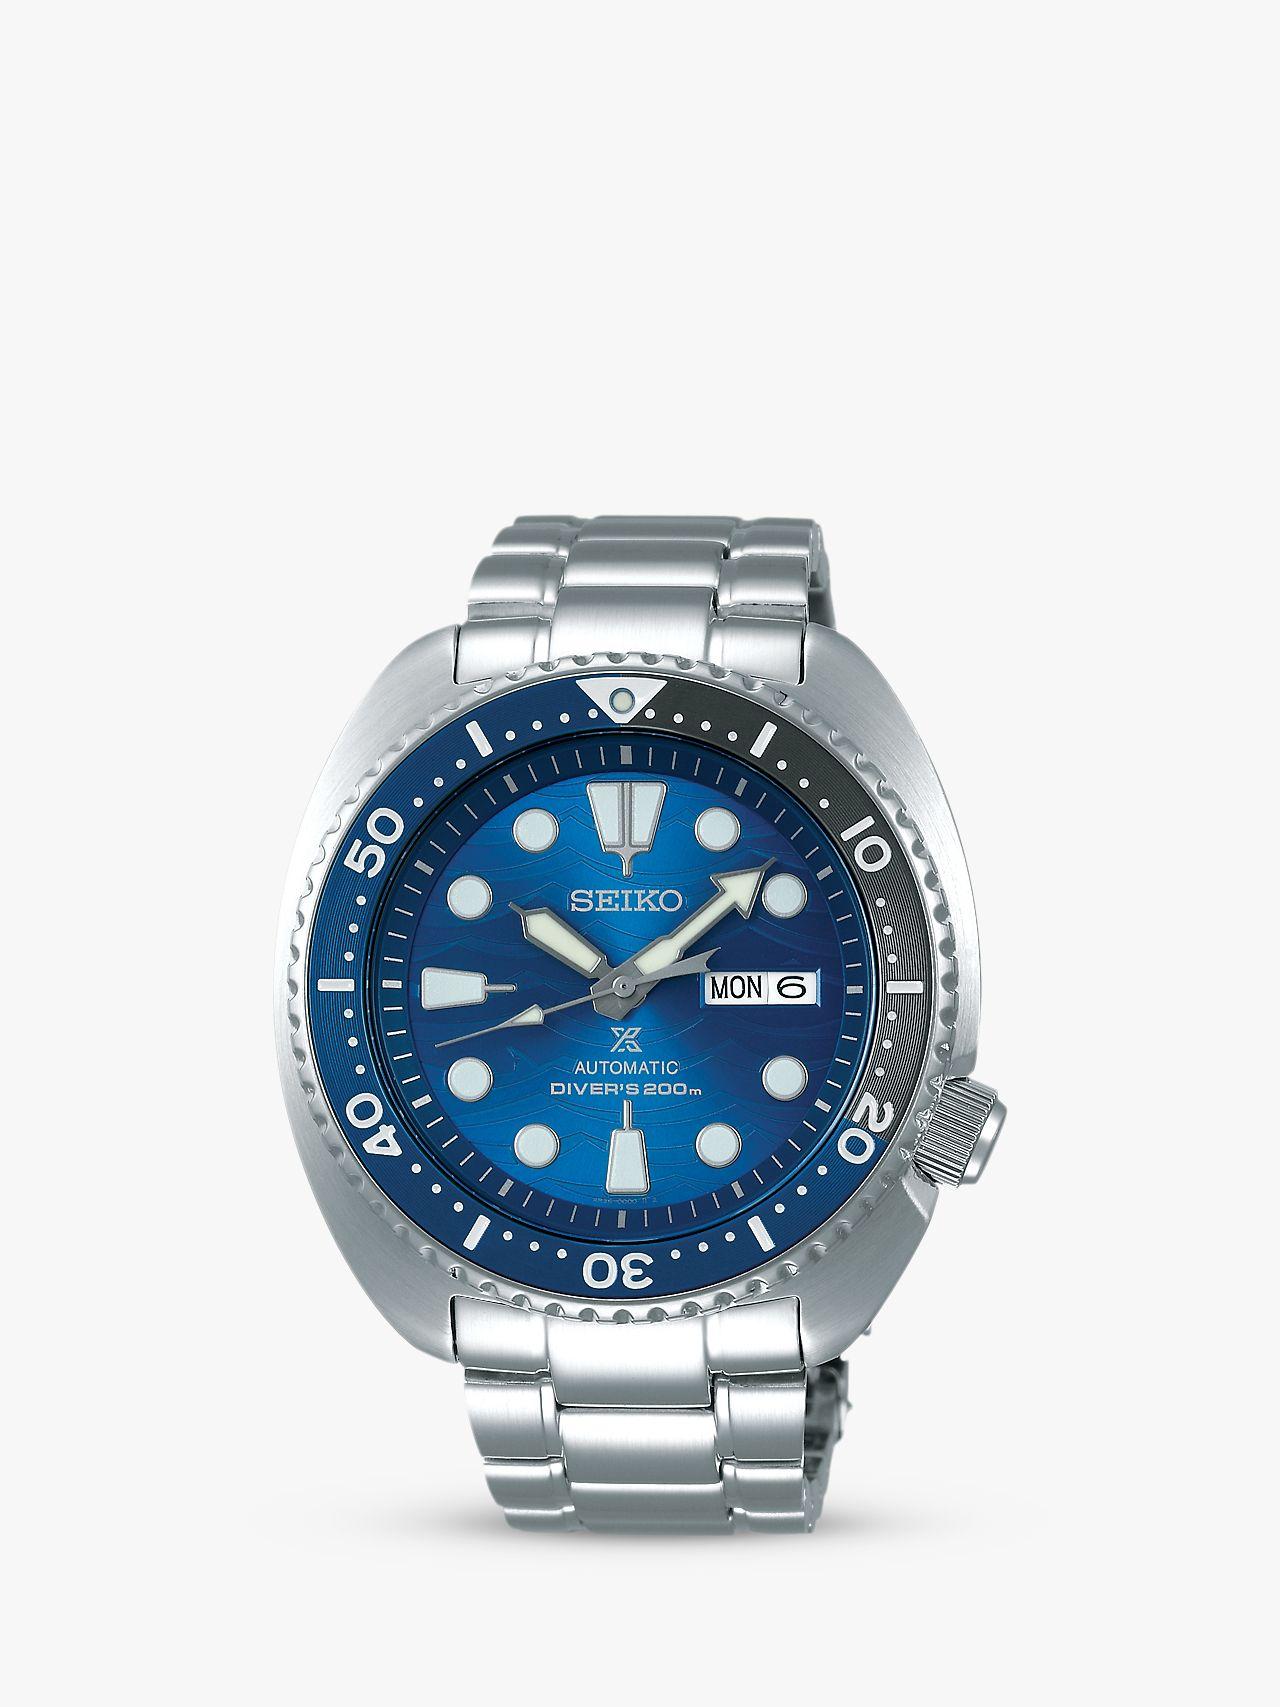 Seiko Seiko SRPD21K1 Men's Prospex Divers Automatic Day Date Bracelet Strap Watch, Silver/Blue